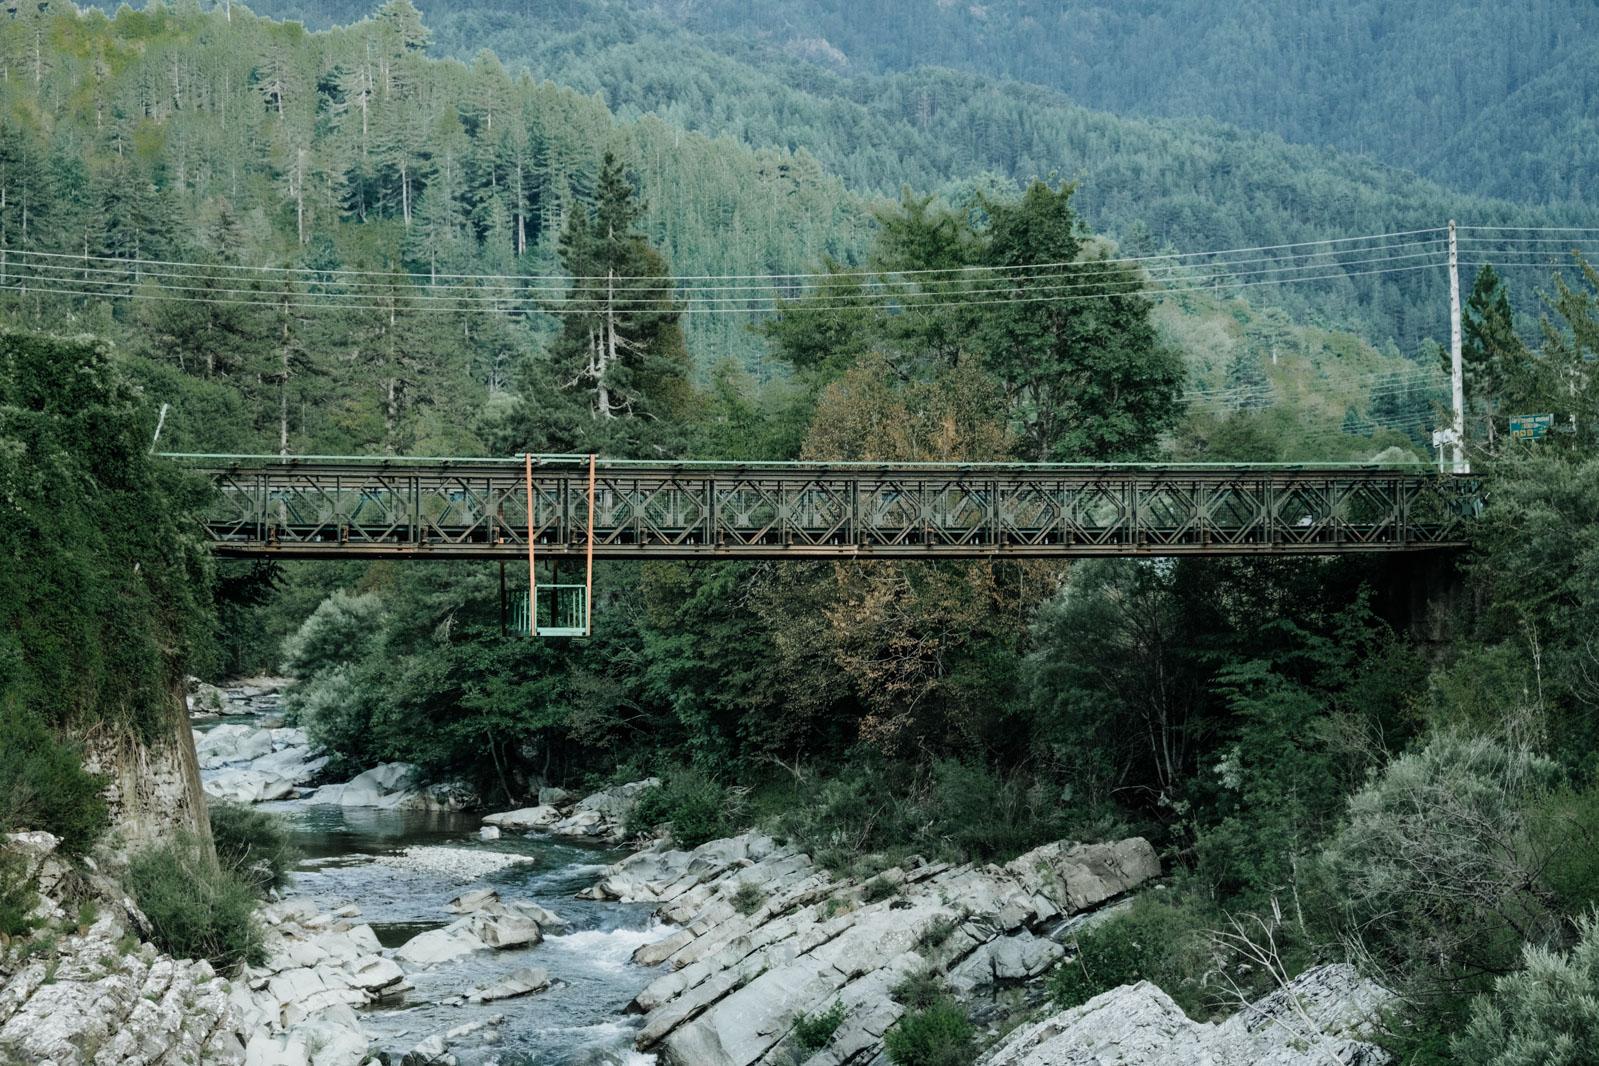 Where The River Runs Mute by Sakis Dazanis